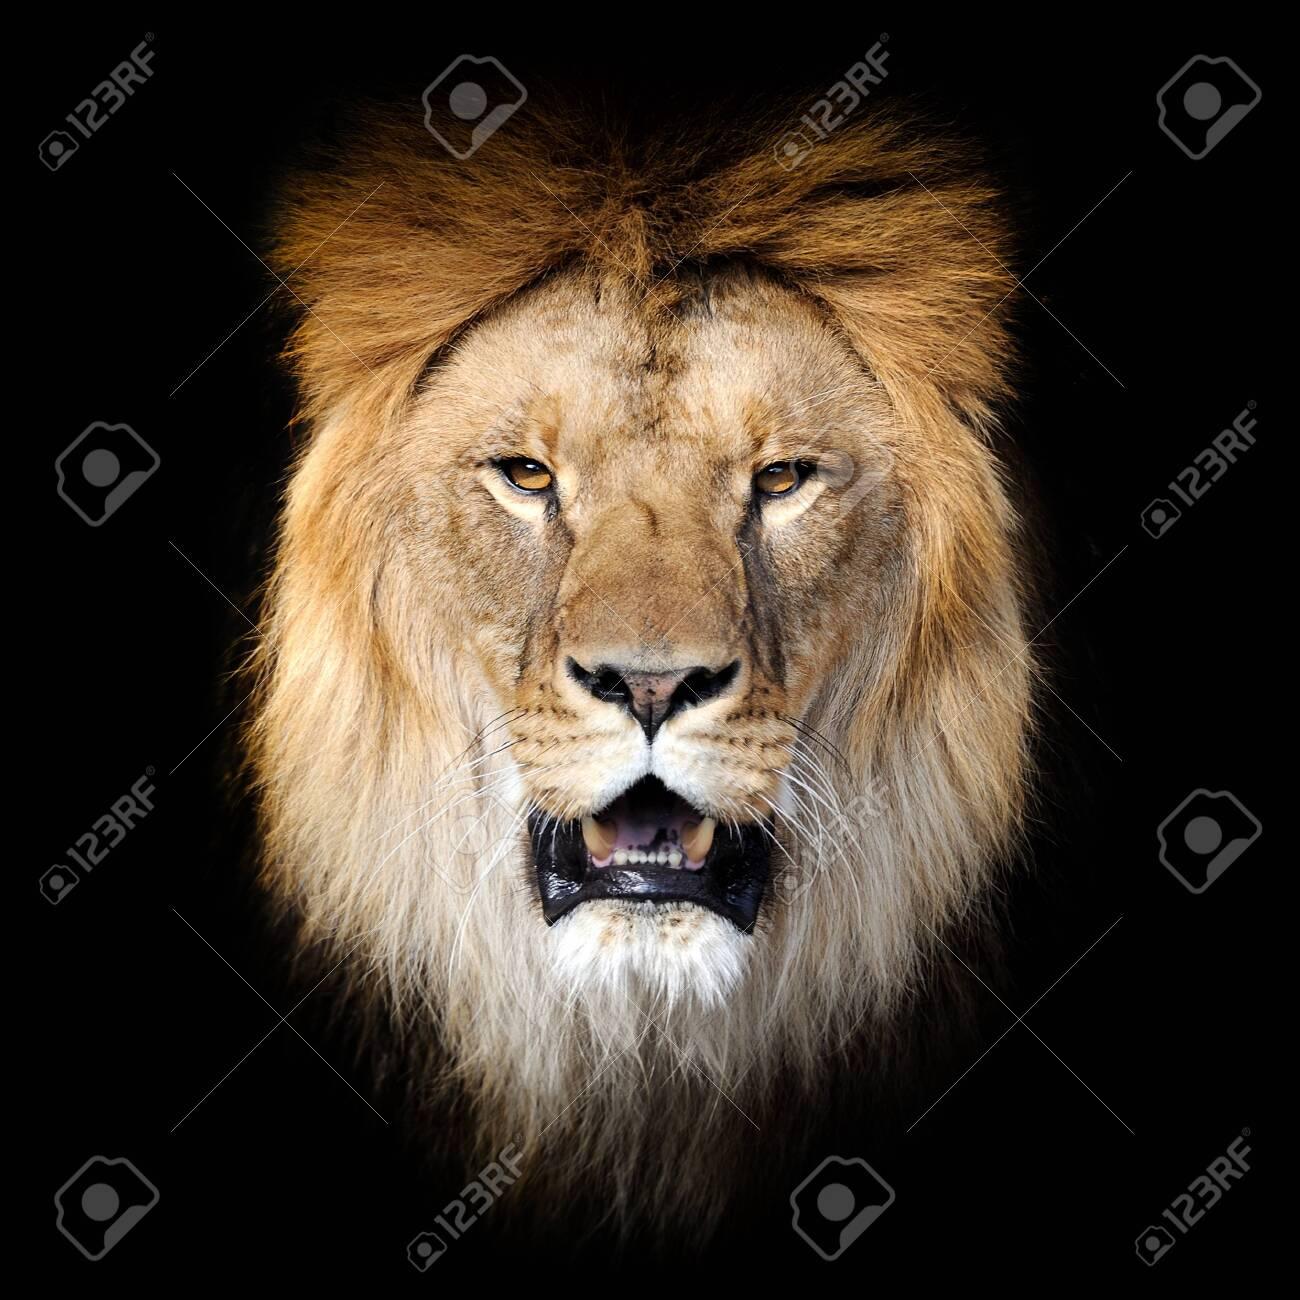 Close up Lion portrait isolated on dark background - 137574618